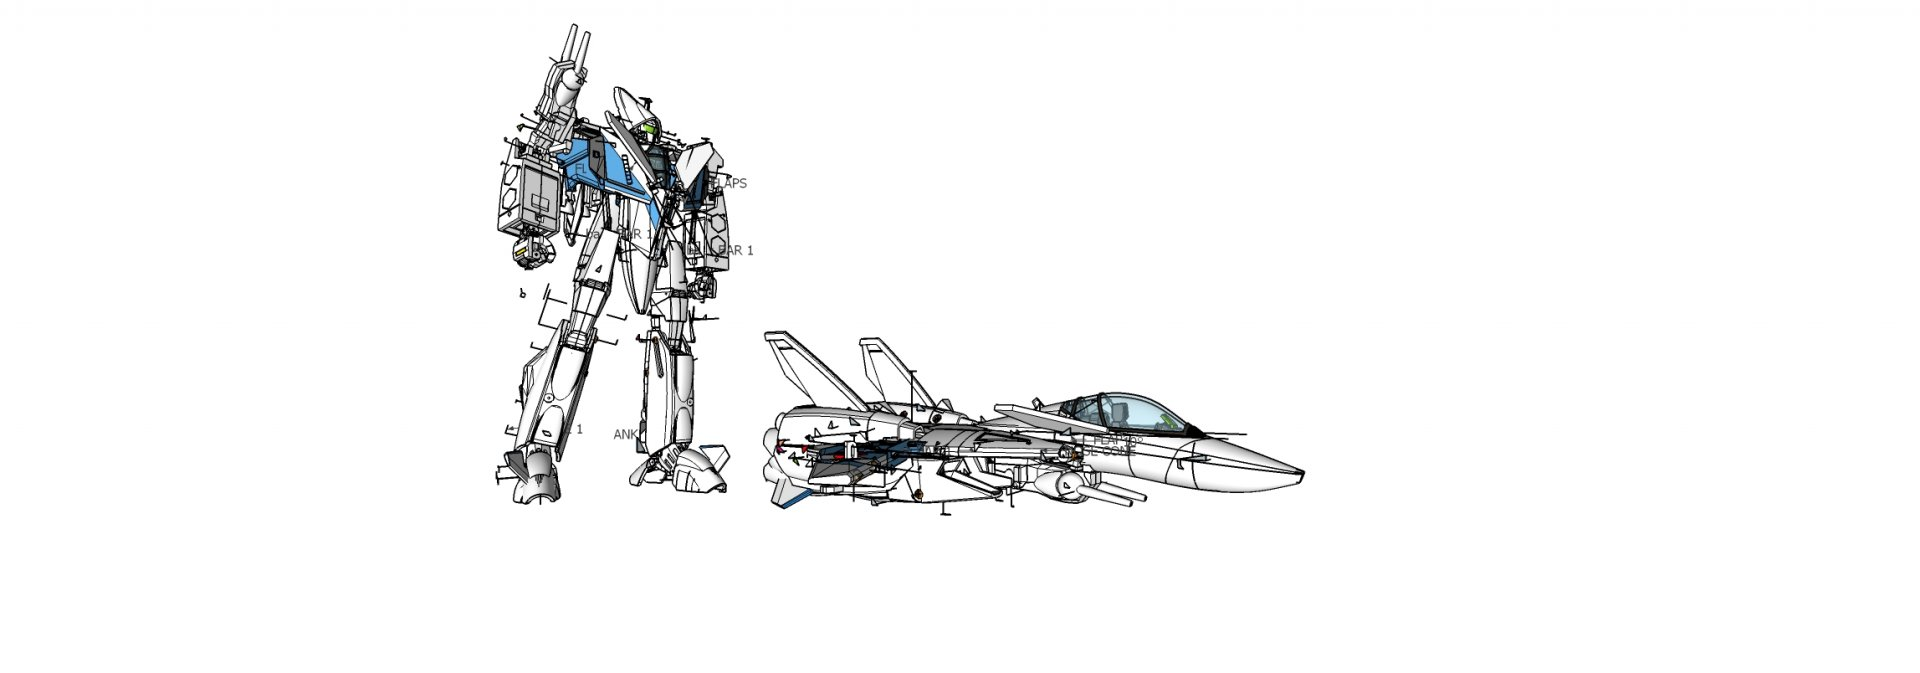 08_01MBIS03 _wingssolution TEST 3.jpg